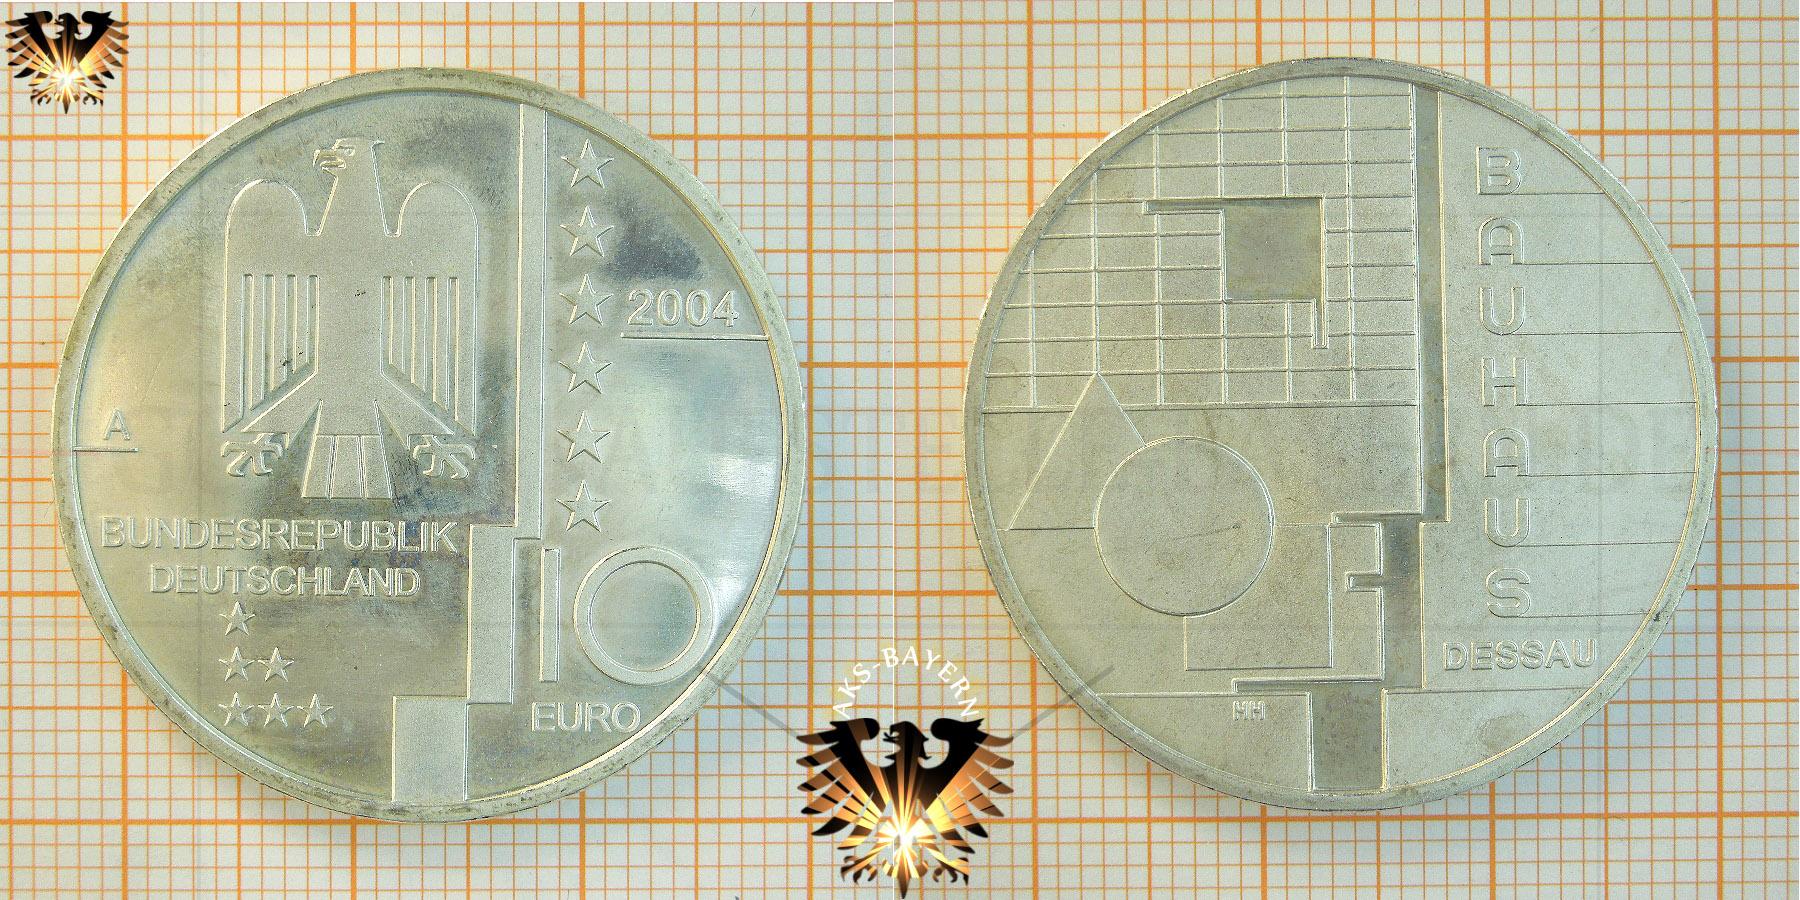 10 Brd 2004 A Bauhaus Dessau Silbermünze Mit Numisblatt 12004